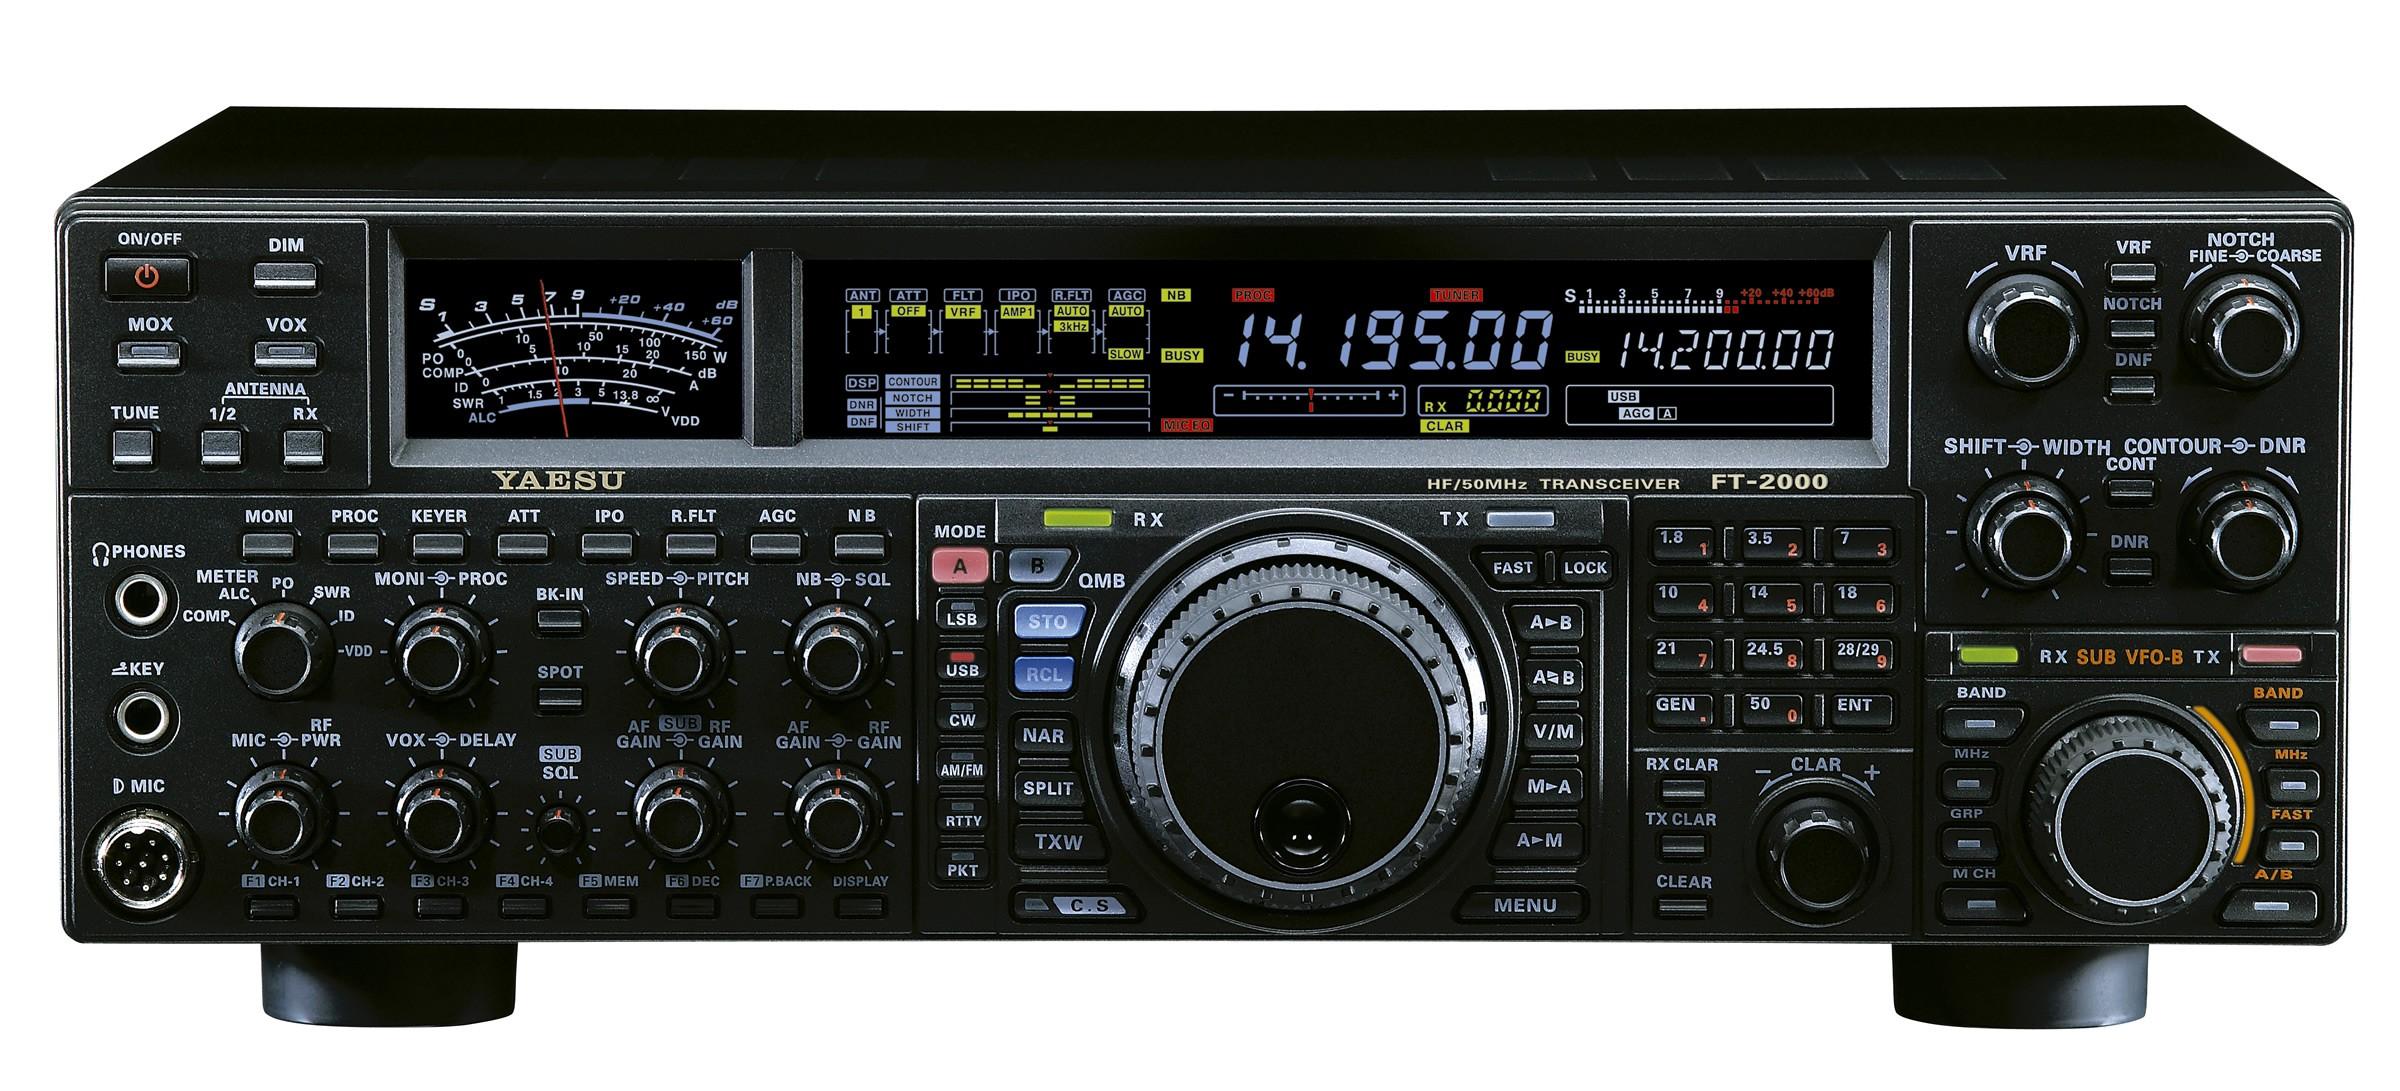 Mfj-1275M Manual